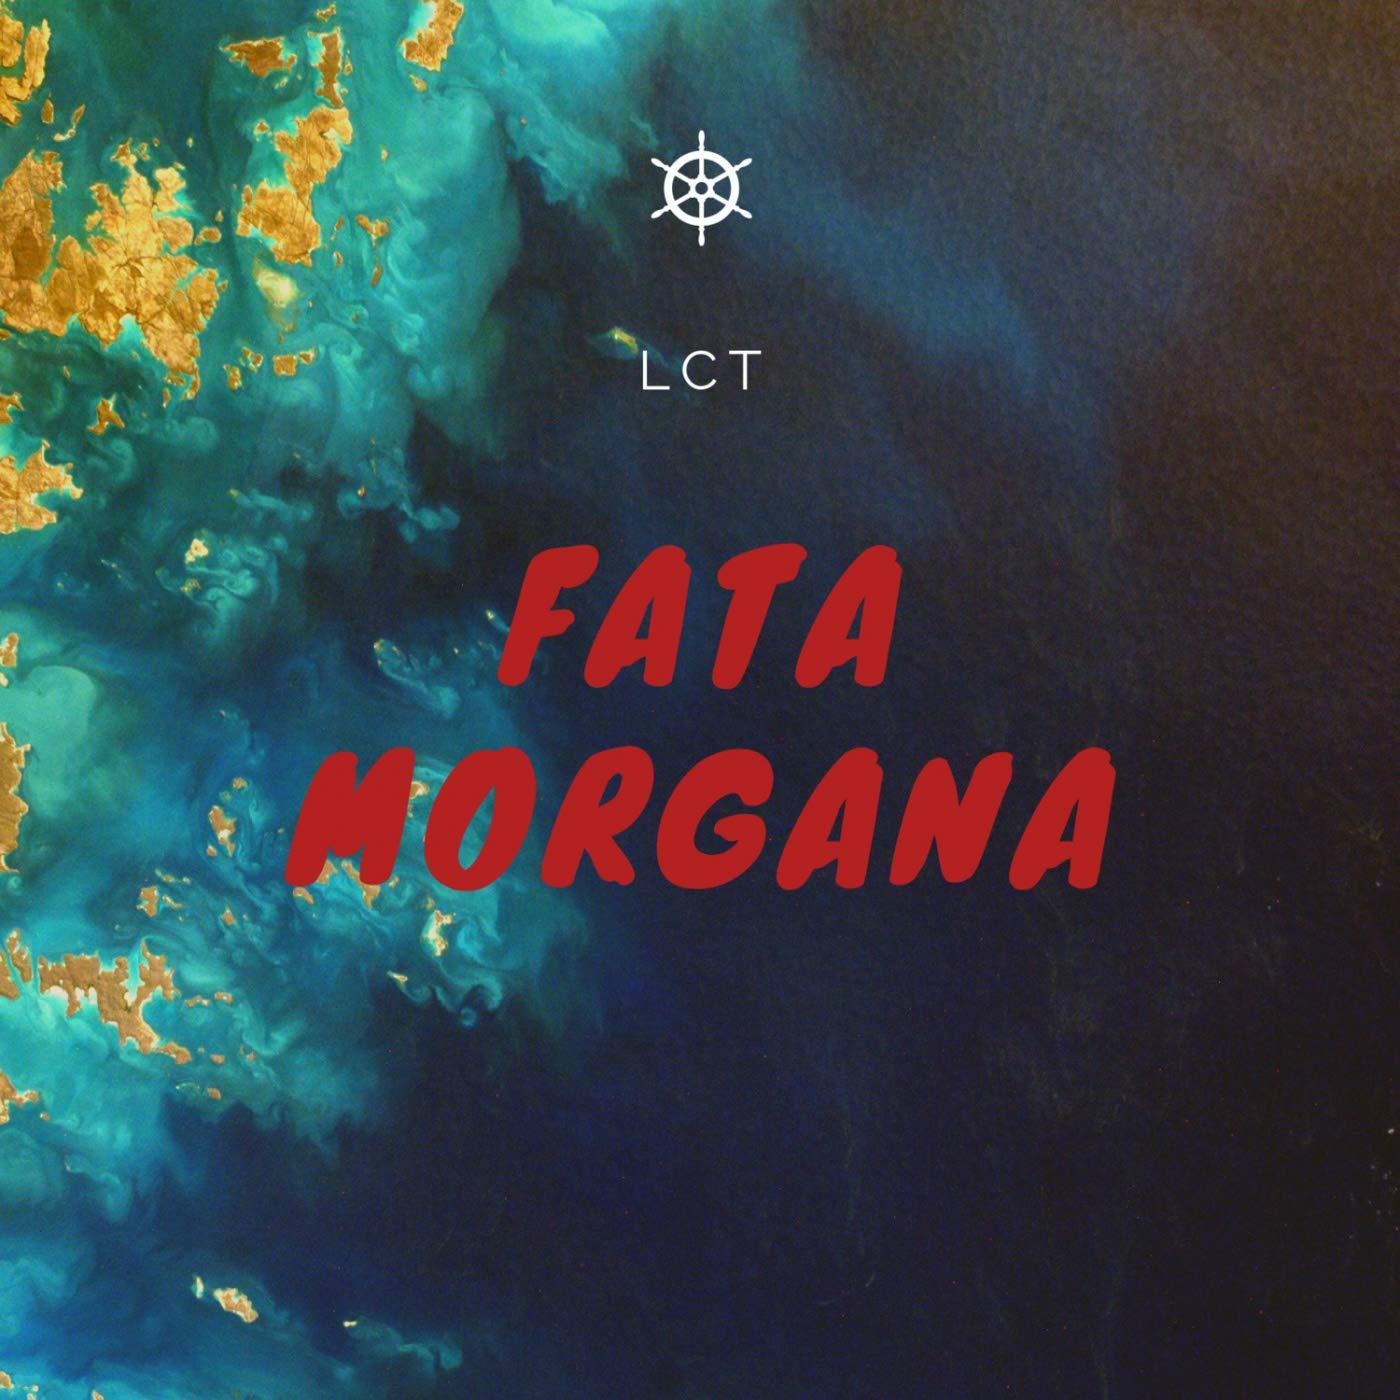 Burkina Faso Fata